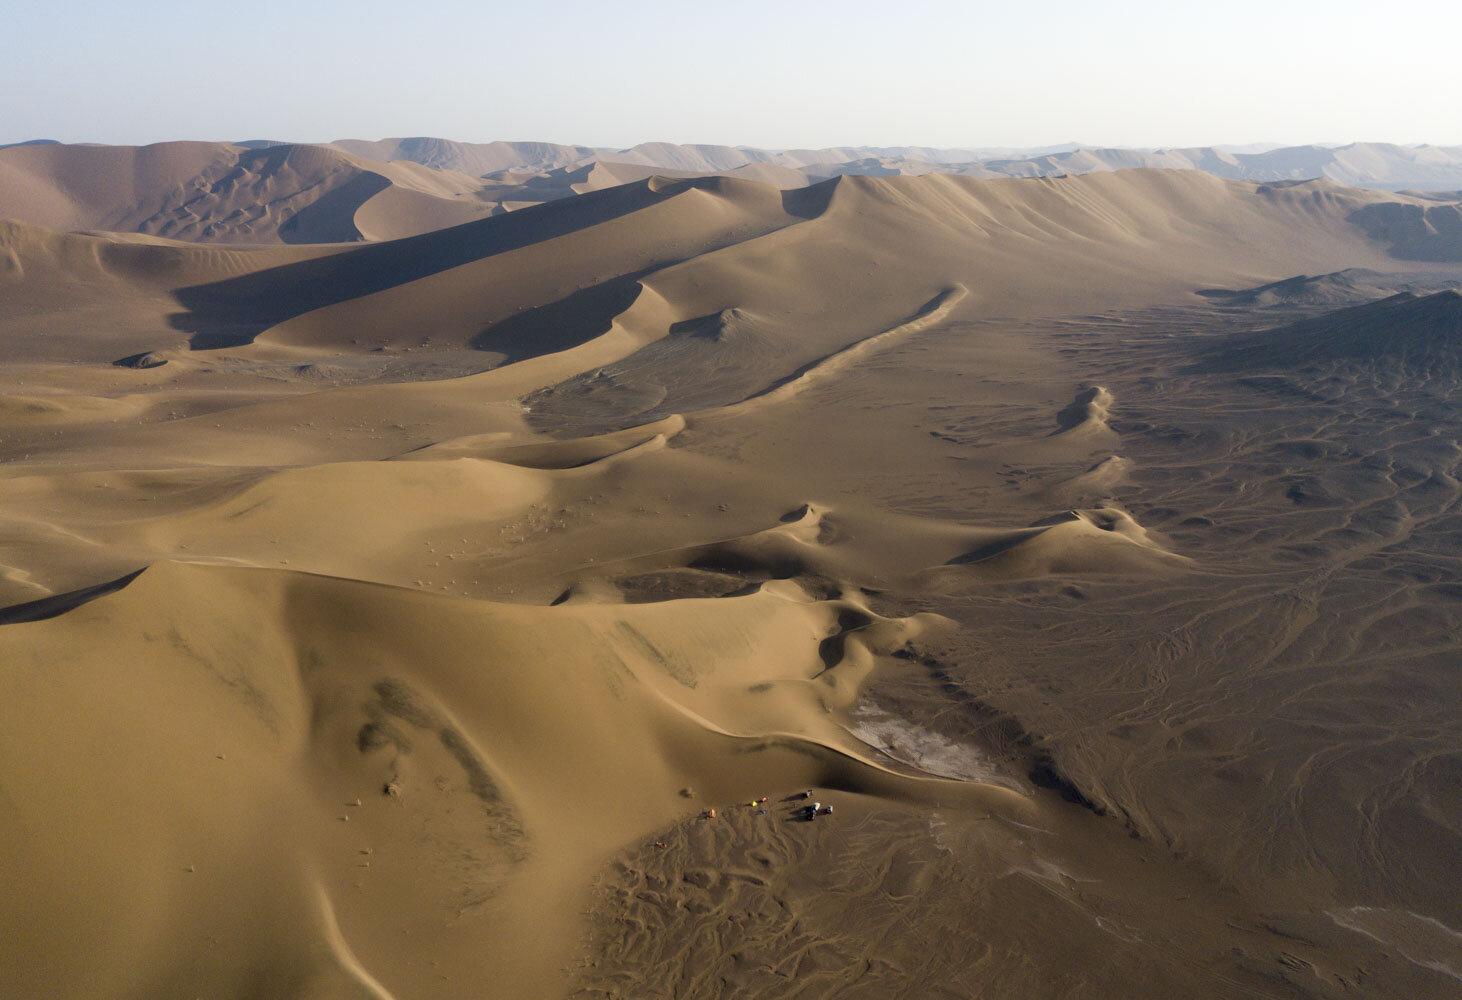 IRAN professional desert expedition — RO